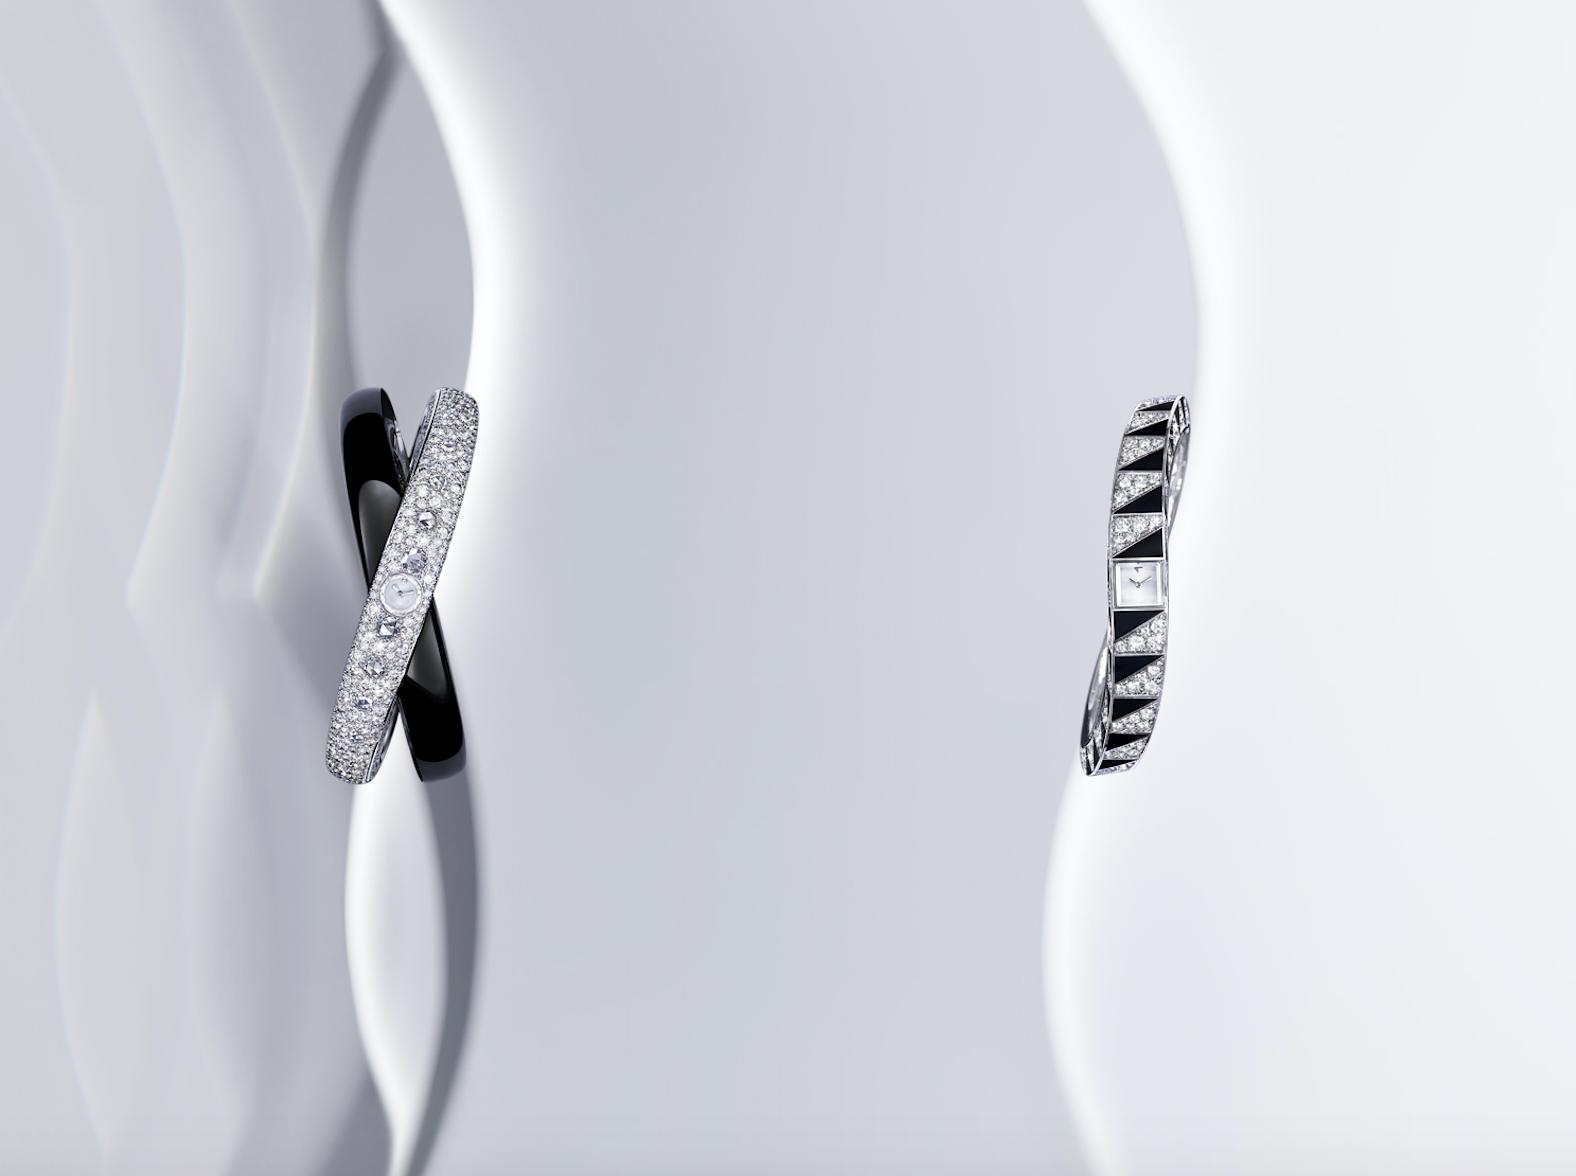 Cartier-Rings-of-Saturn2